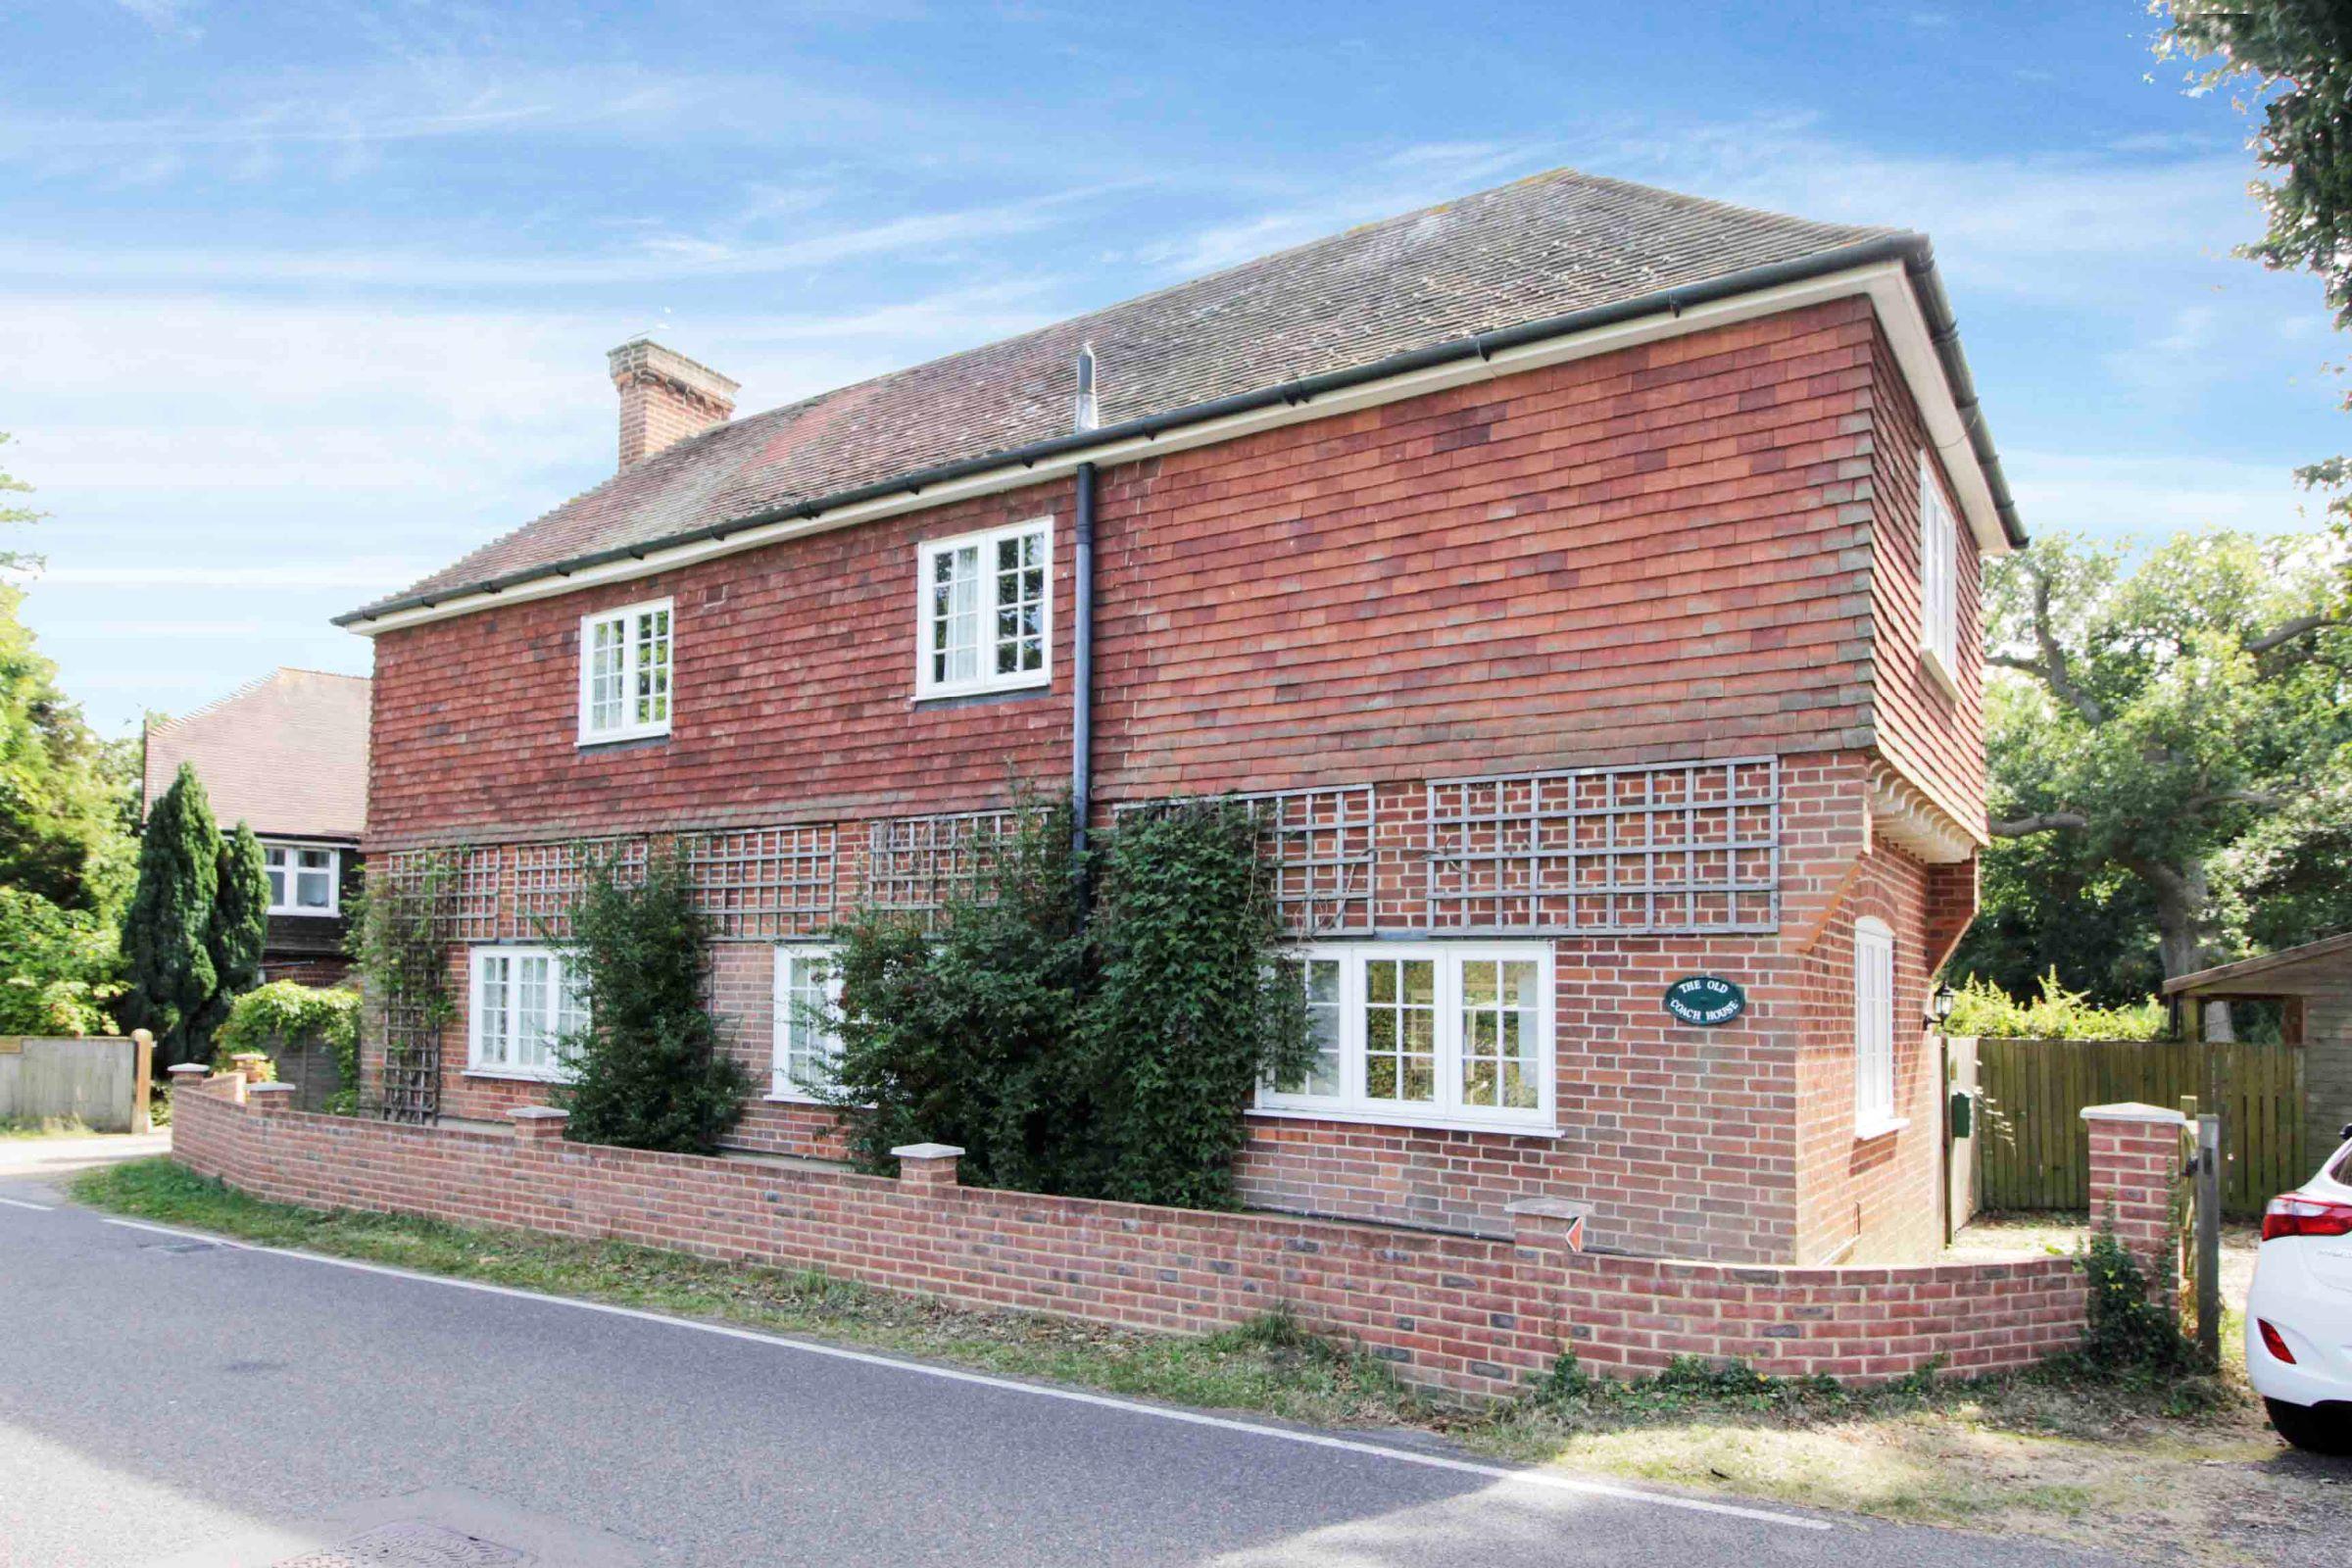 The Old Coach House, Hilders Lane, Edenbridge